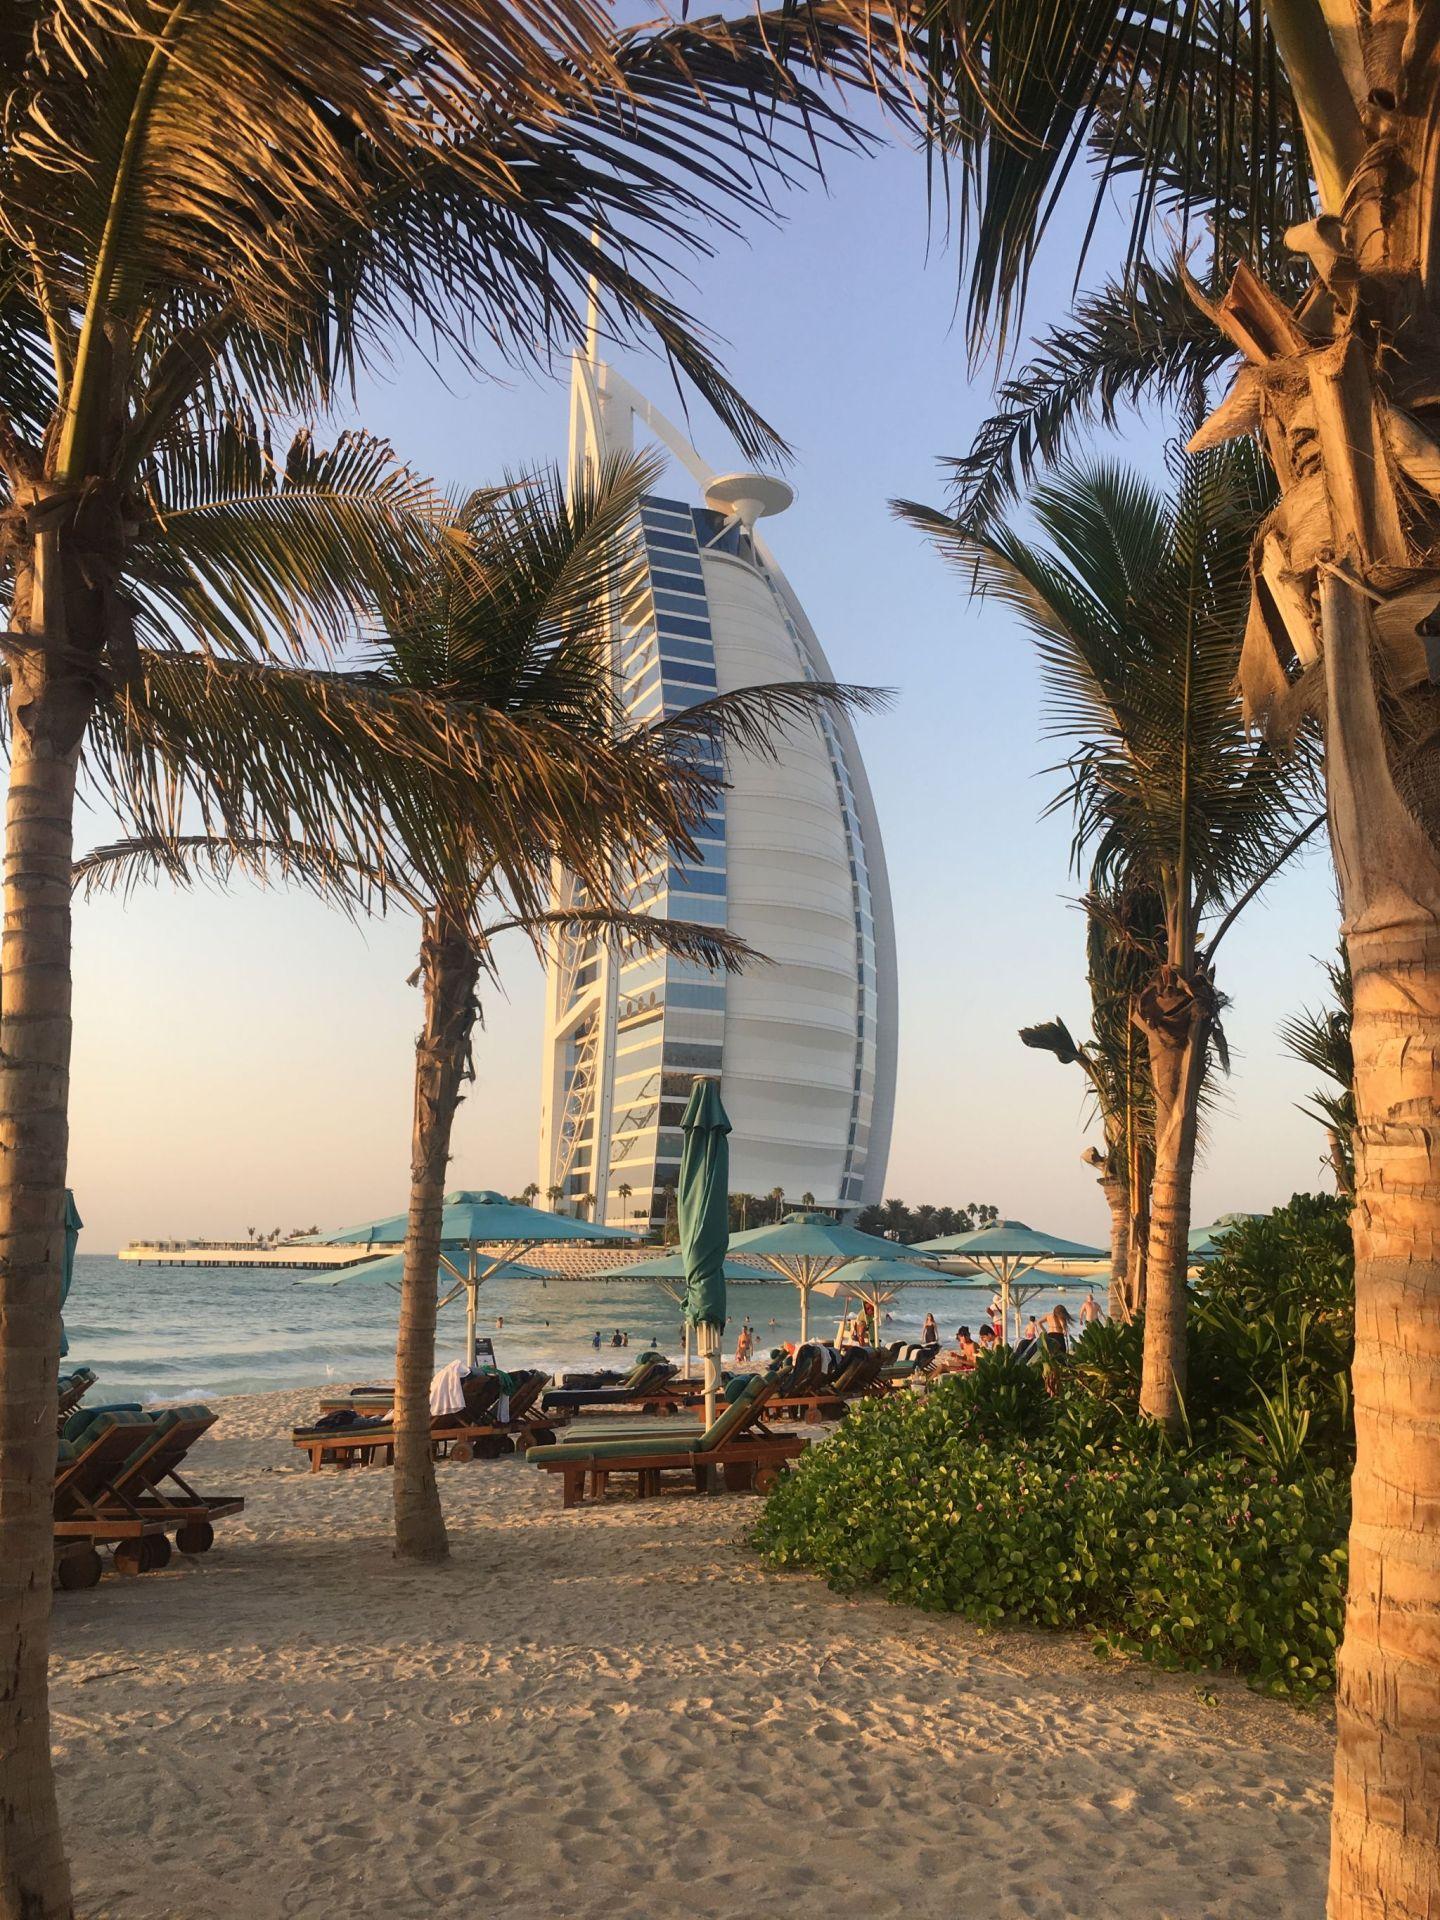 Madinat-Burj-Al-Arab-ViewsMadinat-Burj-Al-Arab-Views